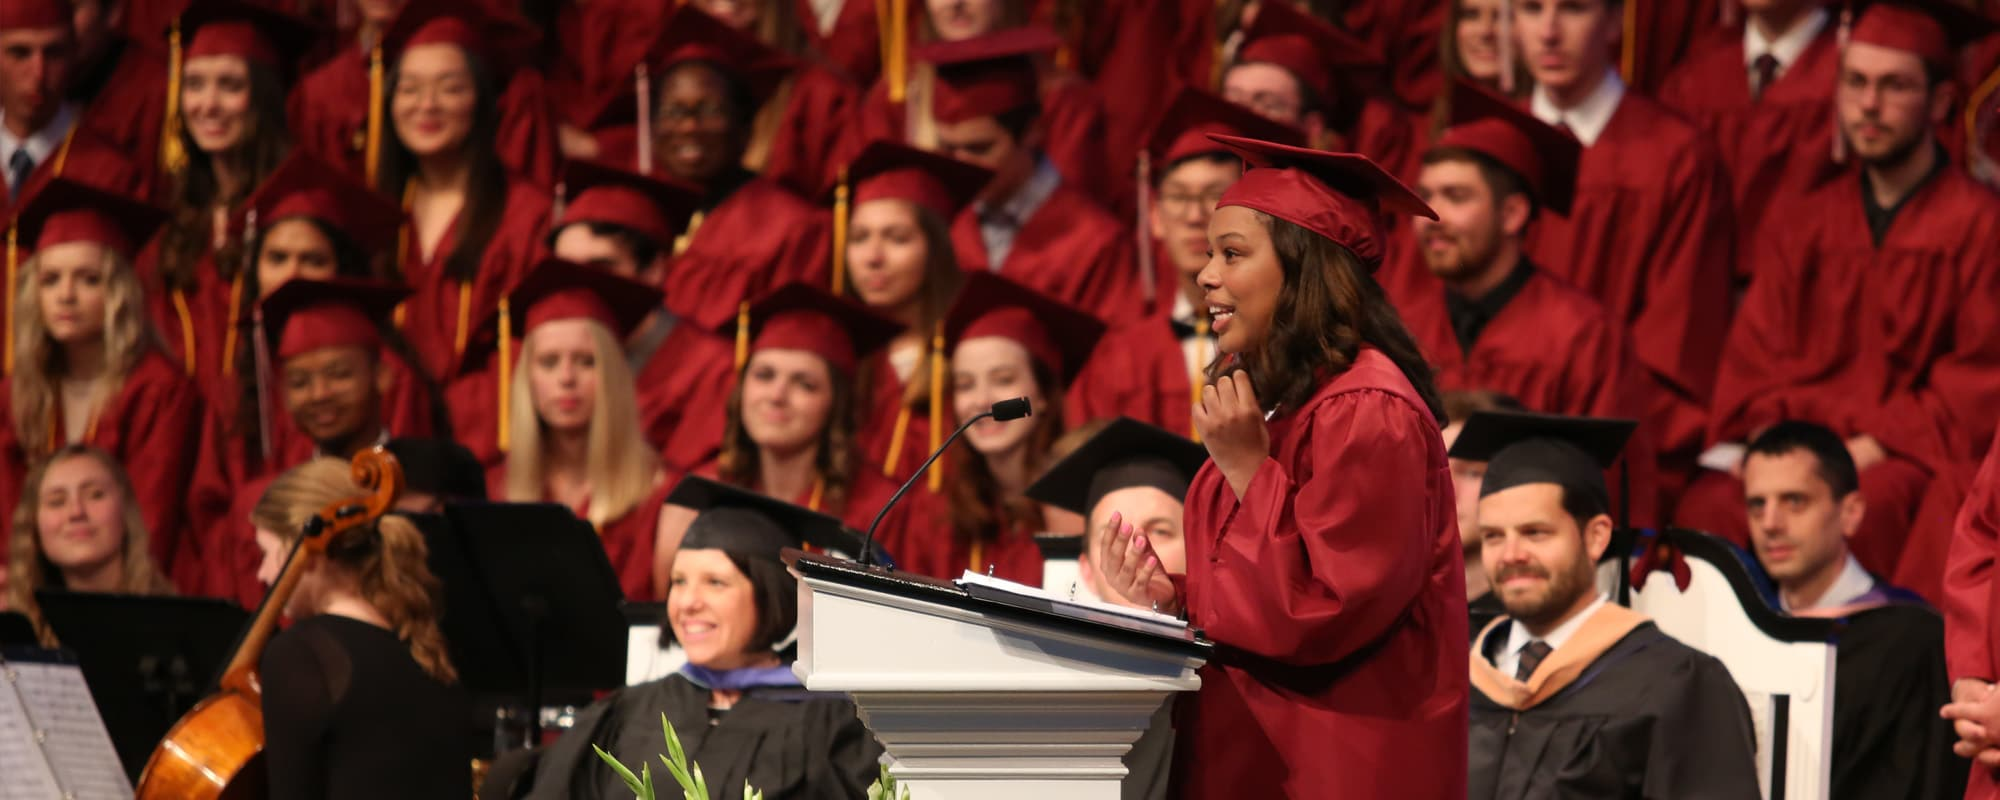 Lelah Pitts Class of 2019 Graduation Speaker